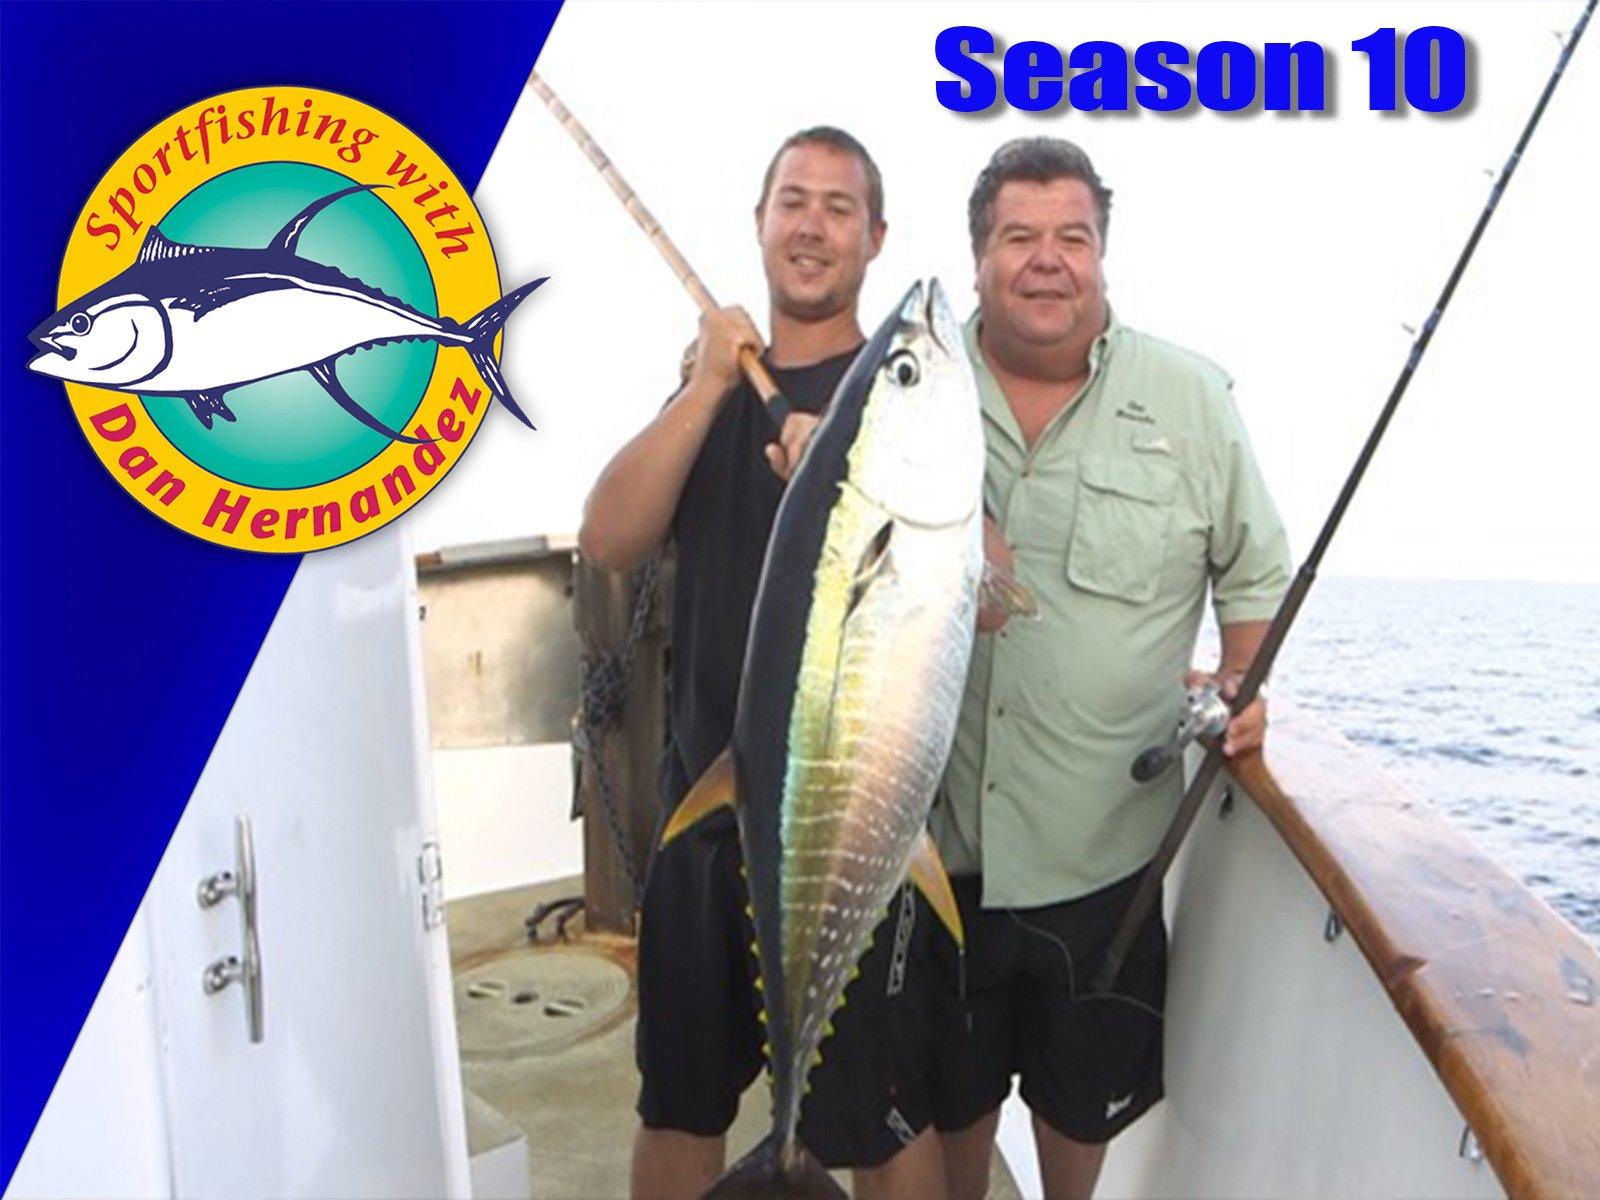 Sport Fishing with Dan Hernandez